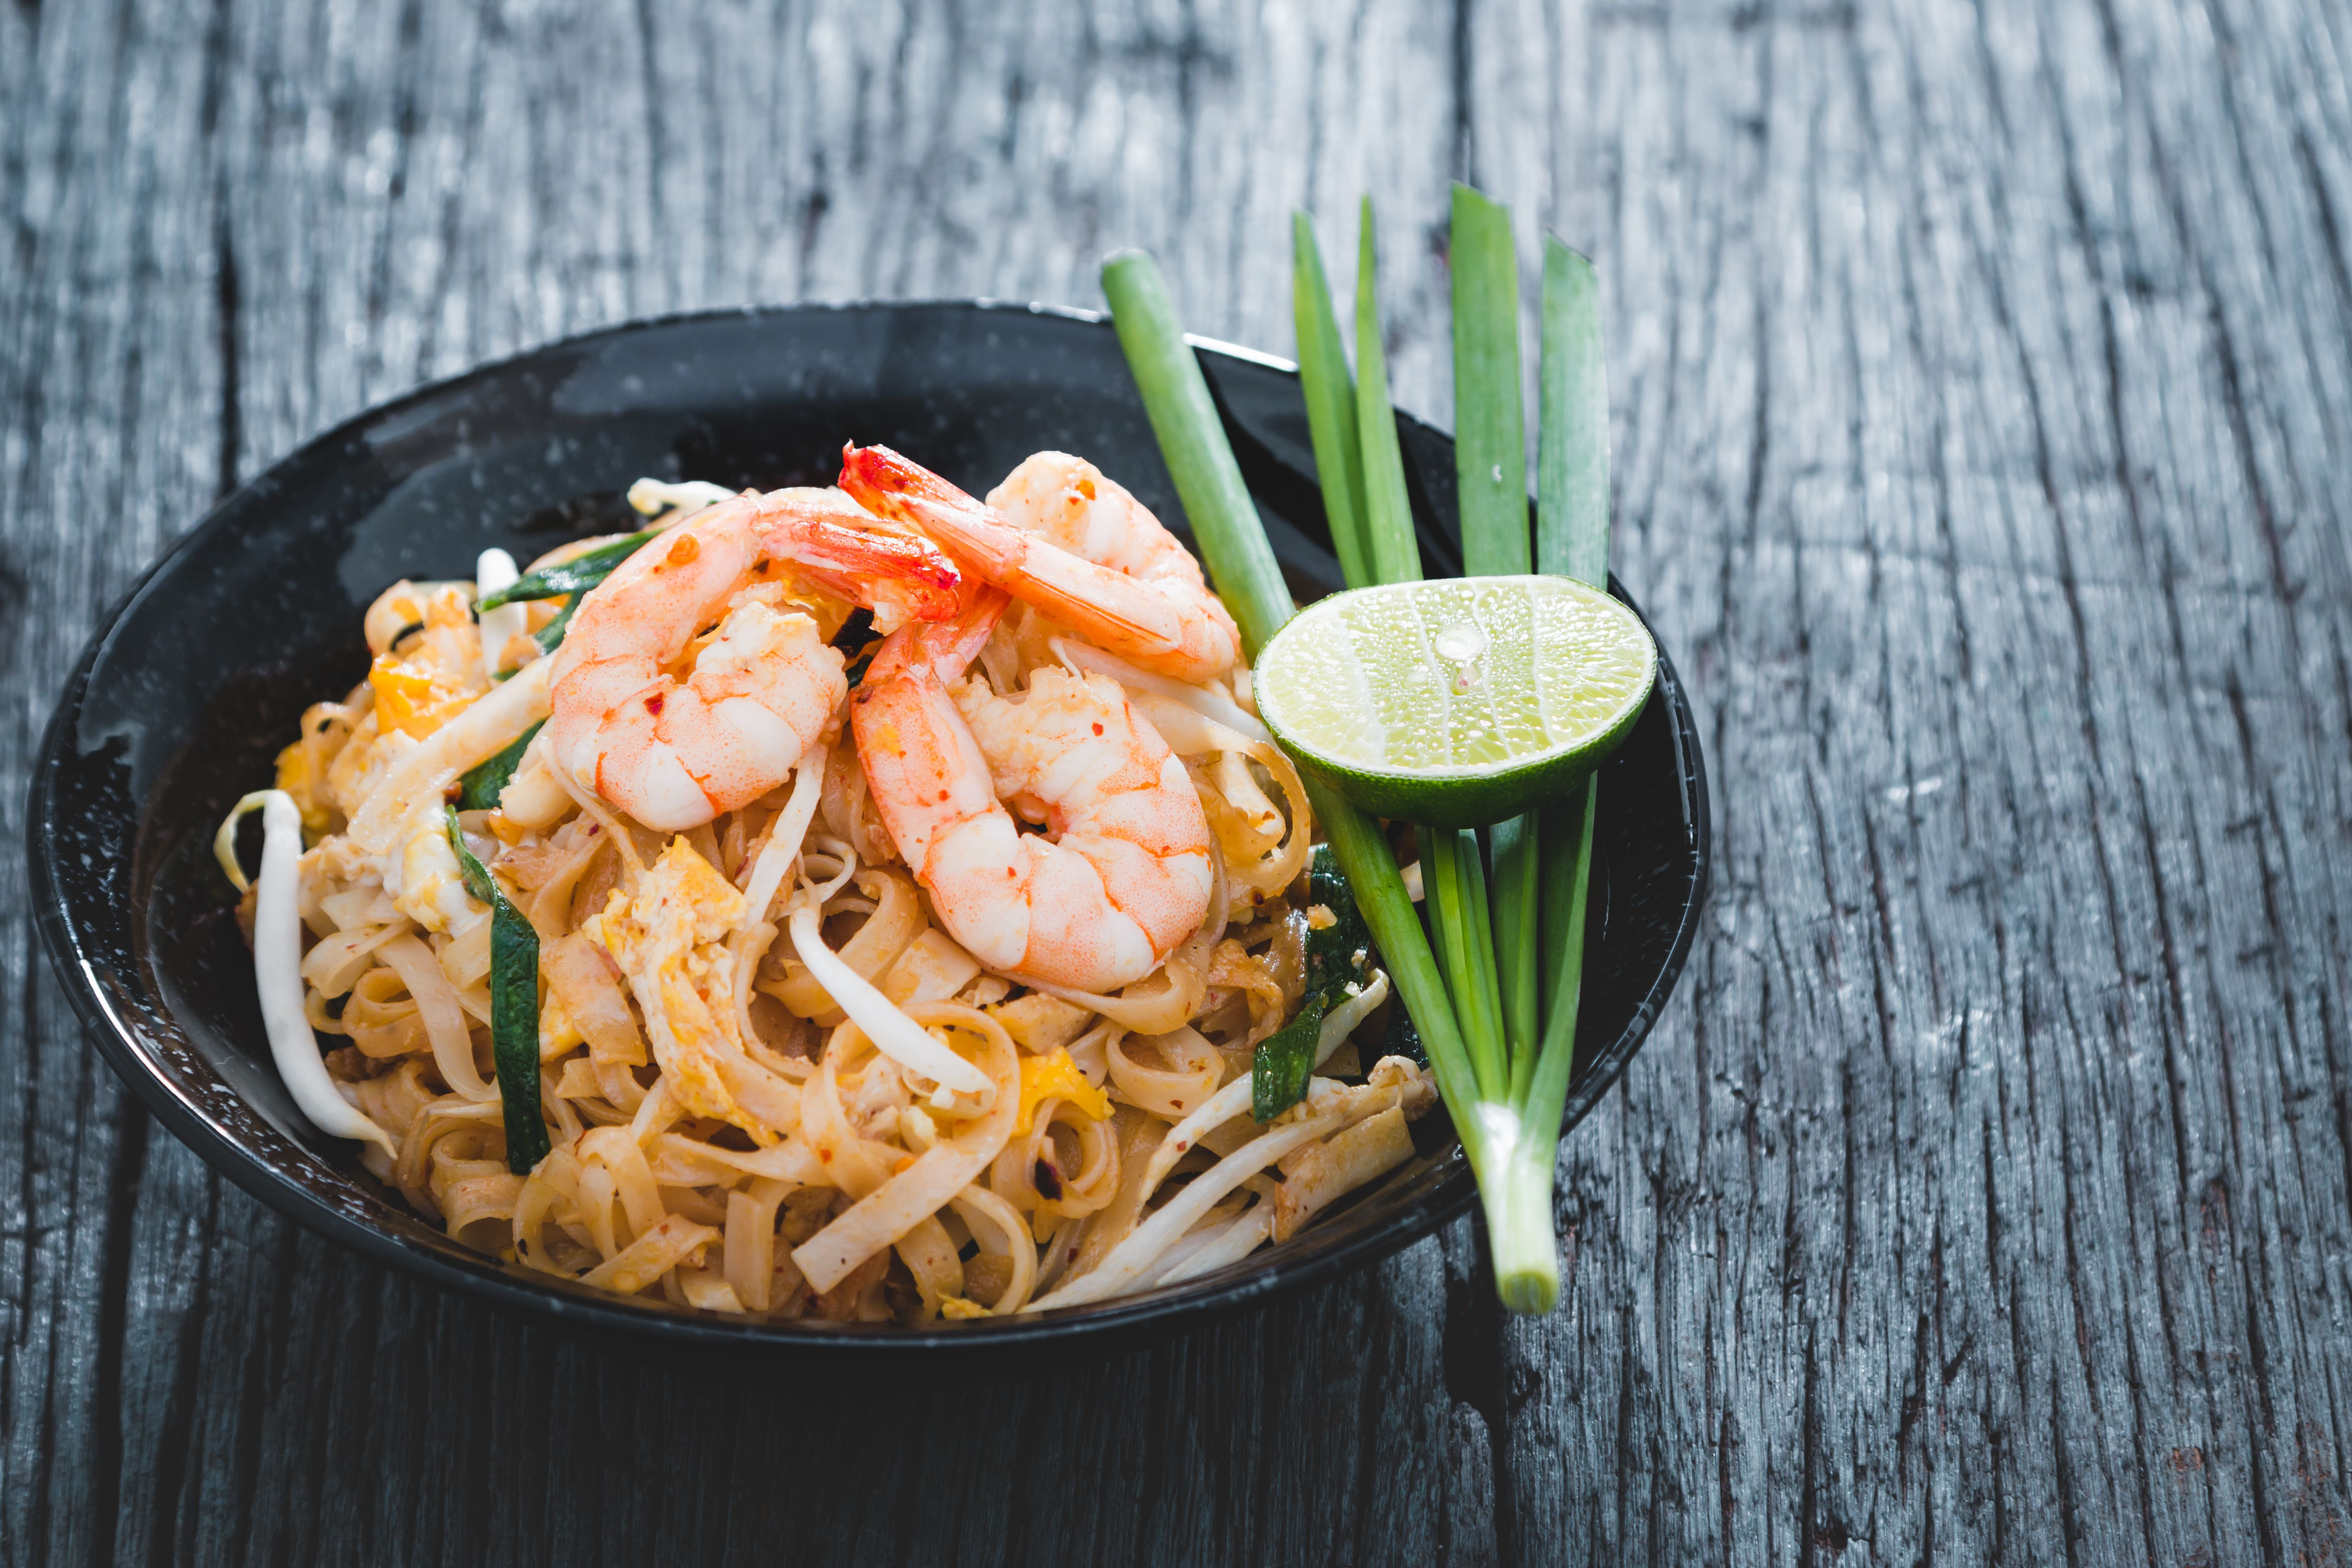 A bowl of pad thai shrimp